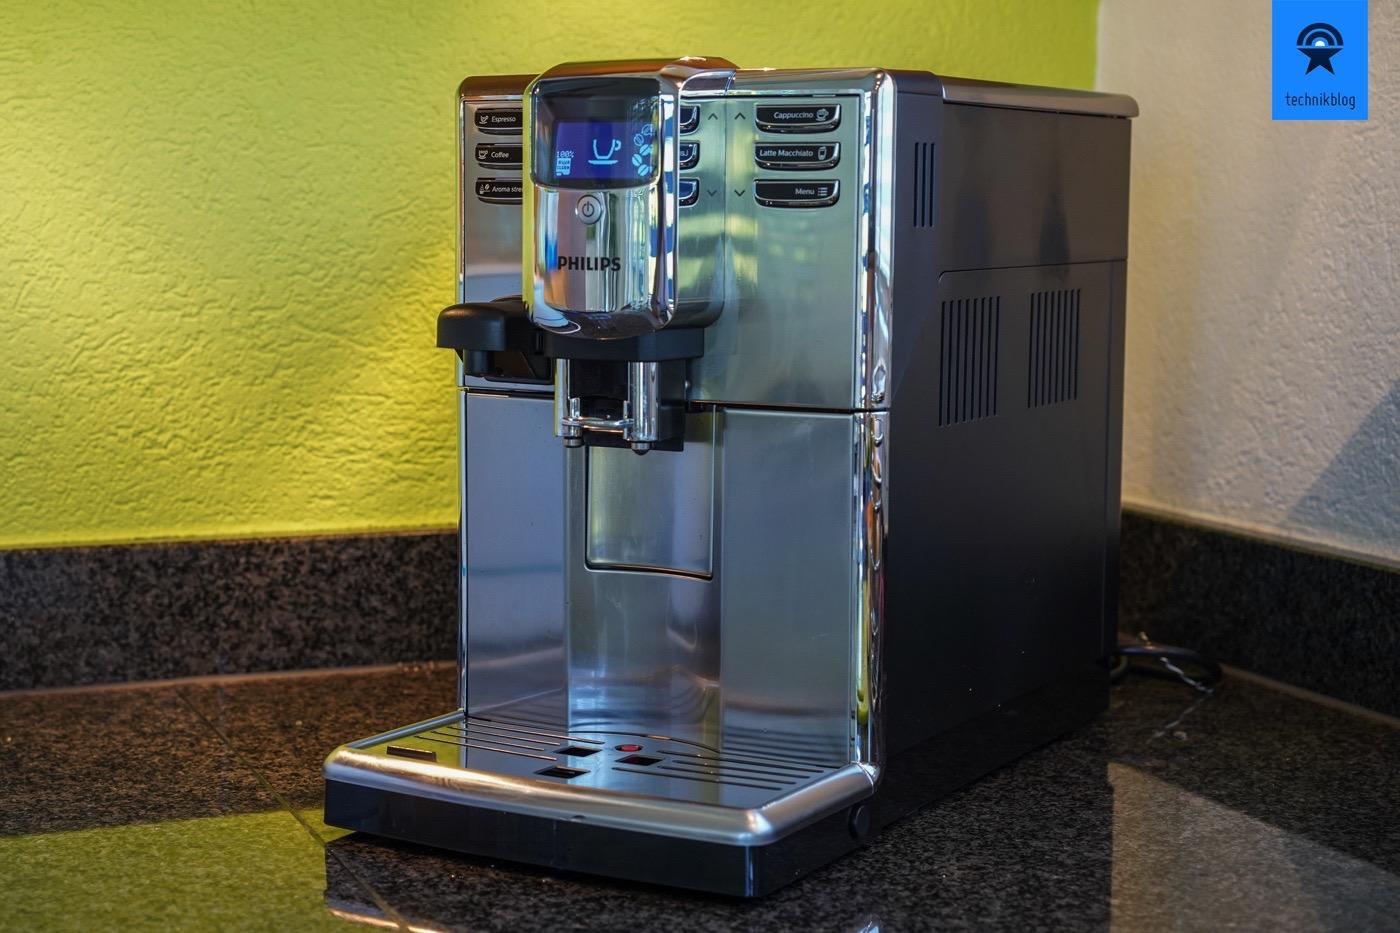 Philips EP5365/10 Kaffeevollautomat